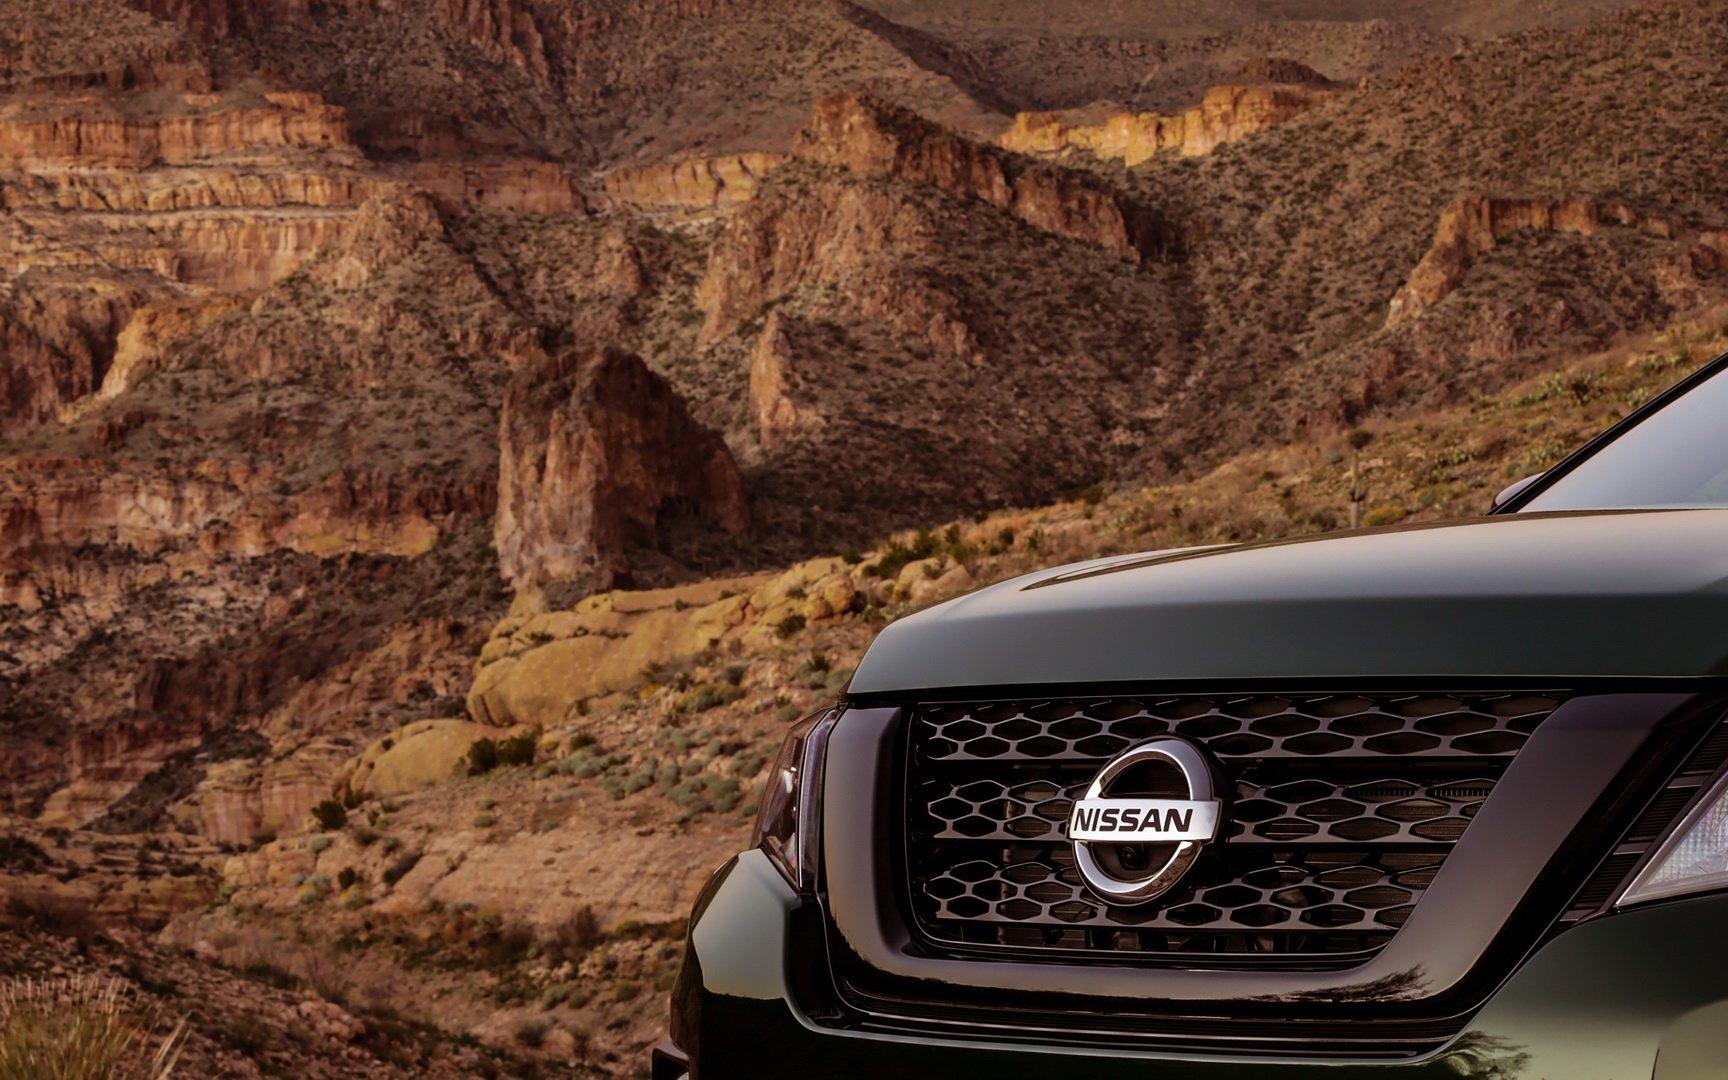 Nissan Pathfinder Rock Creek Edition 2019 (16)